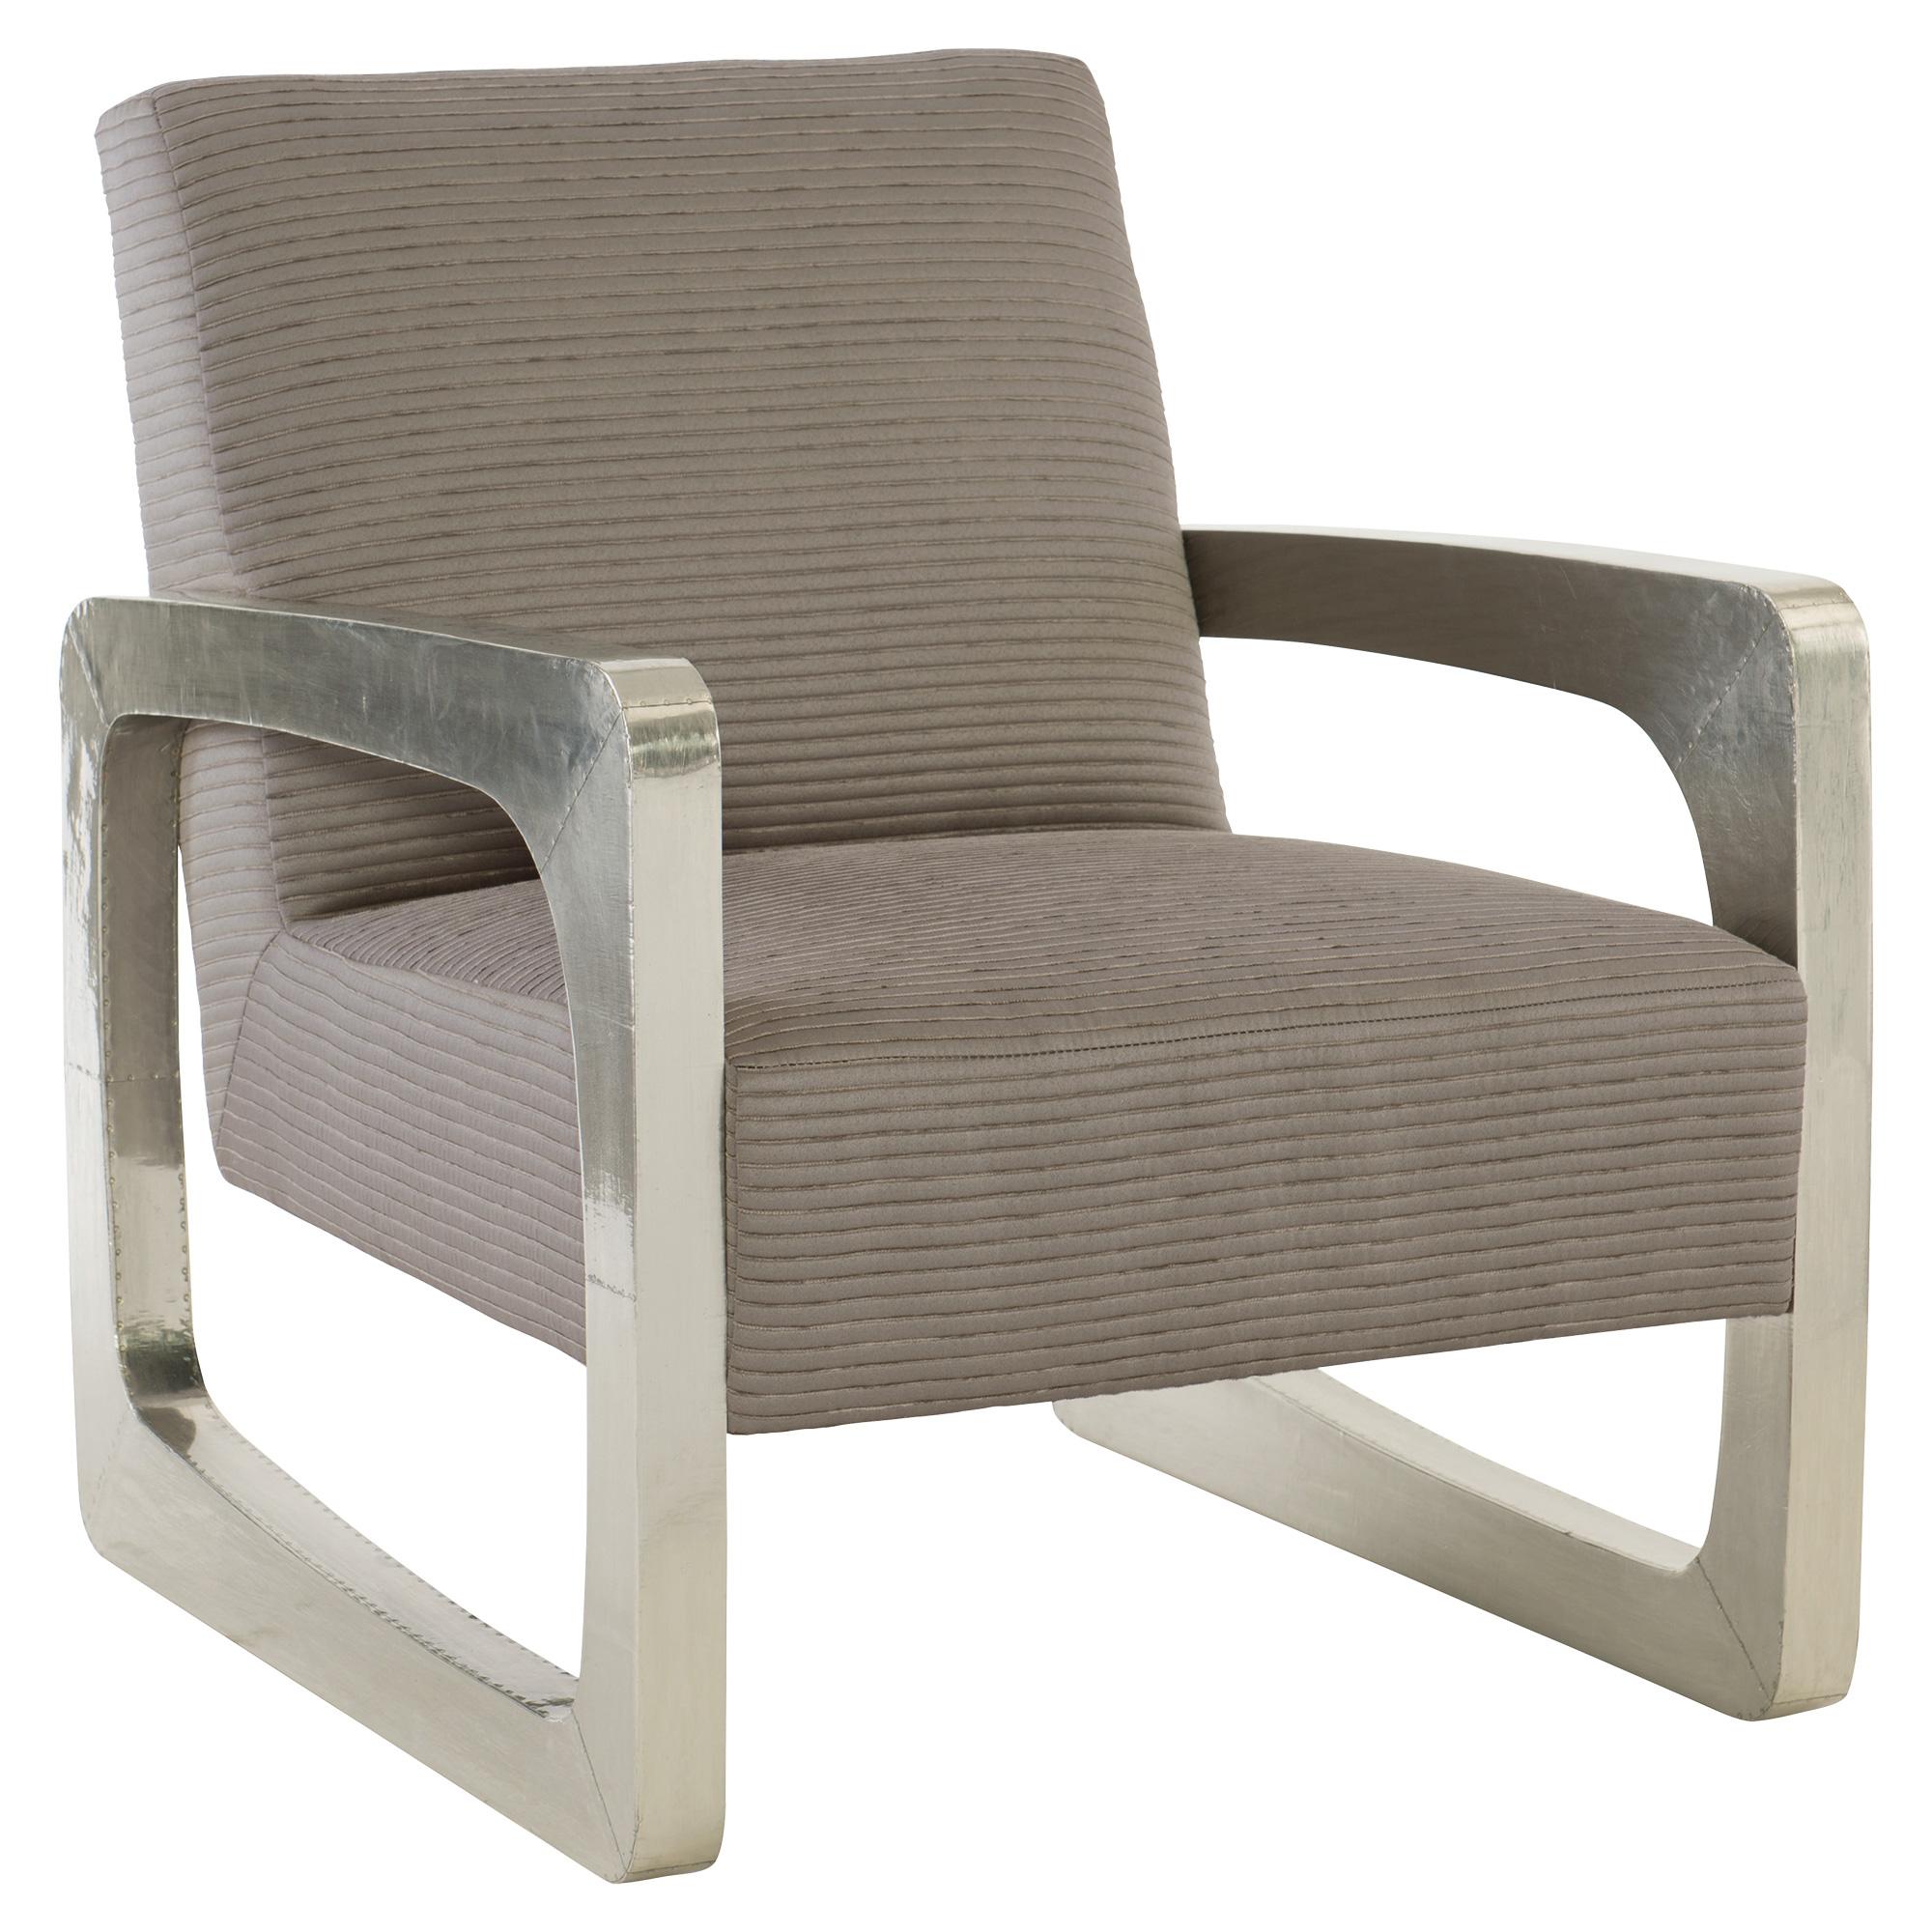 Adella Modern Industrial Silver Metal Textured Grey Armchair